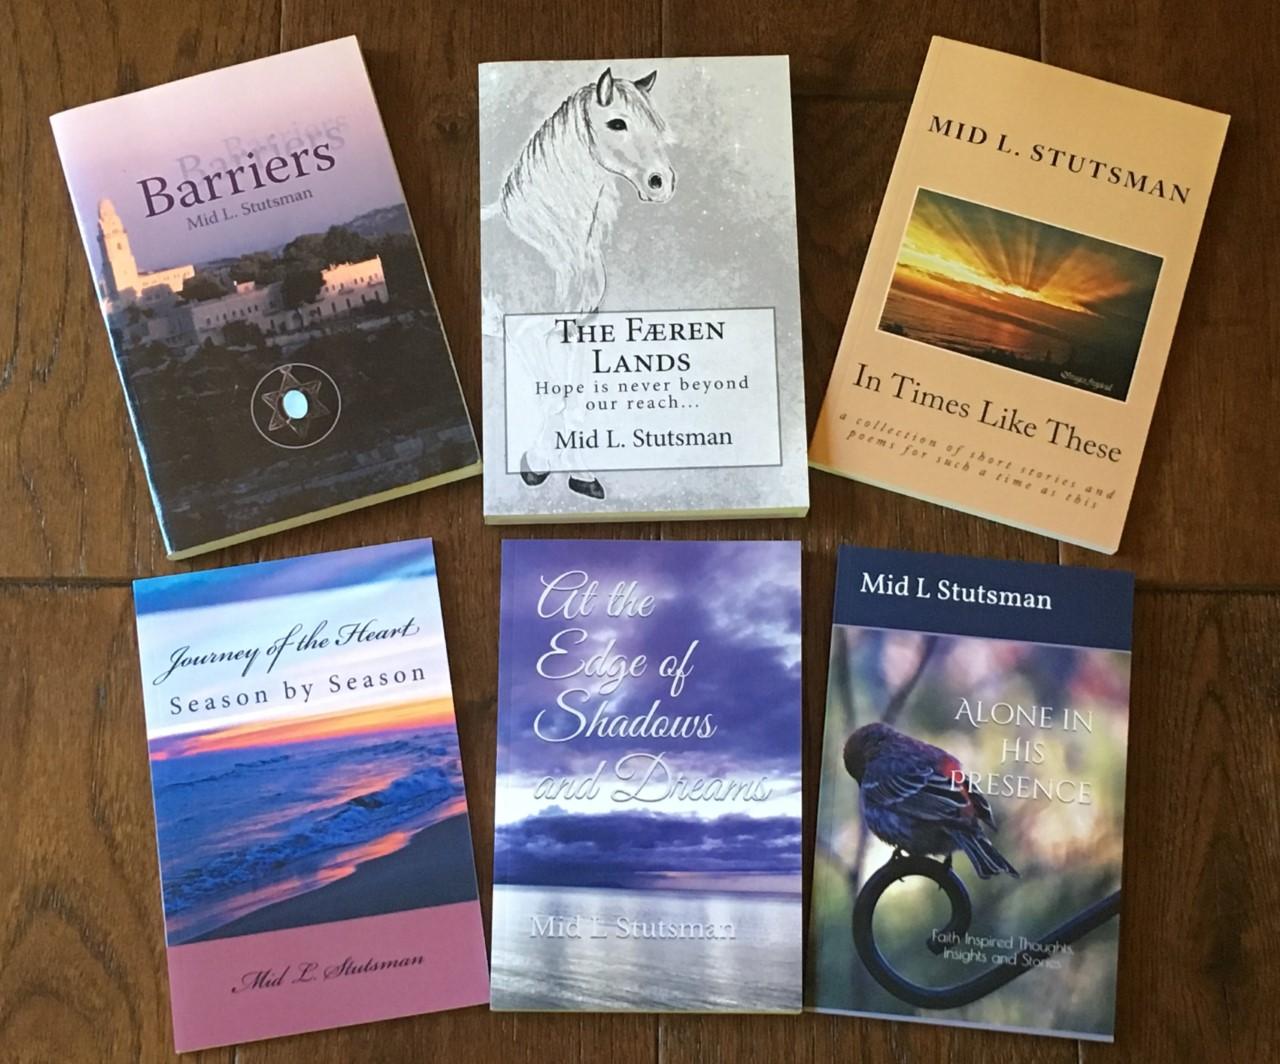 6 books